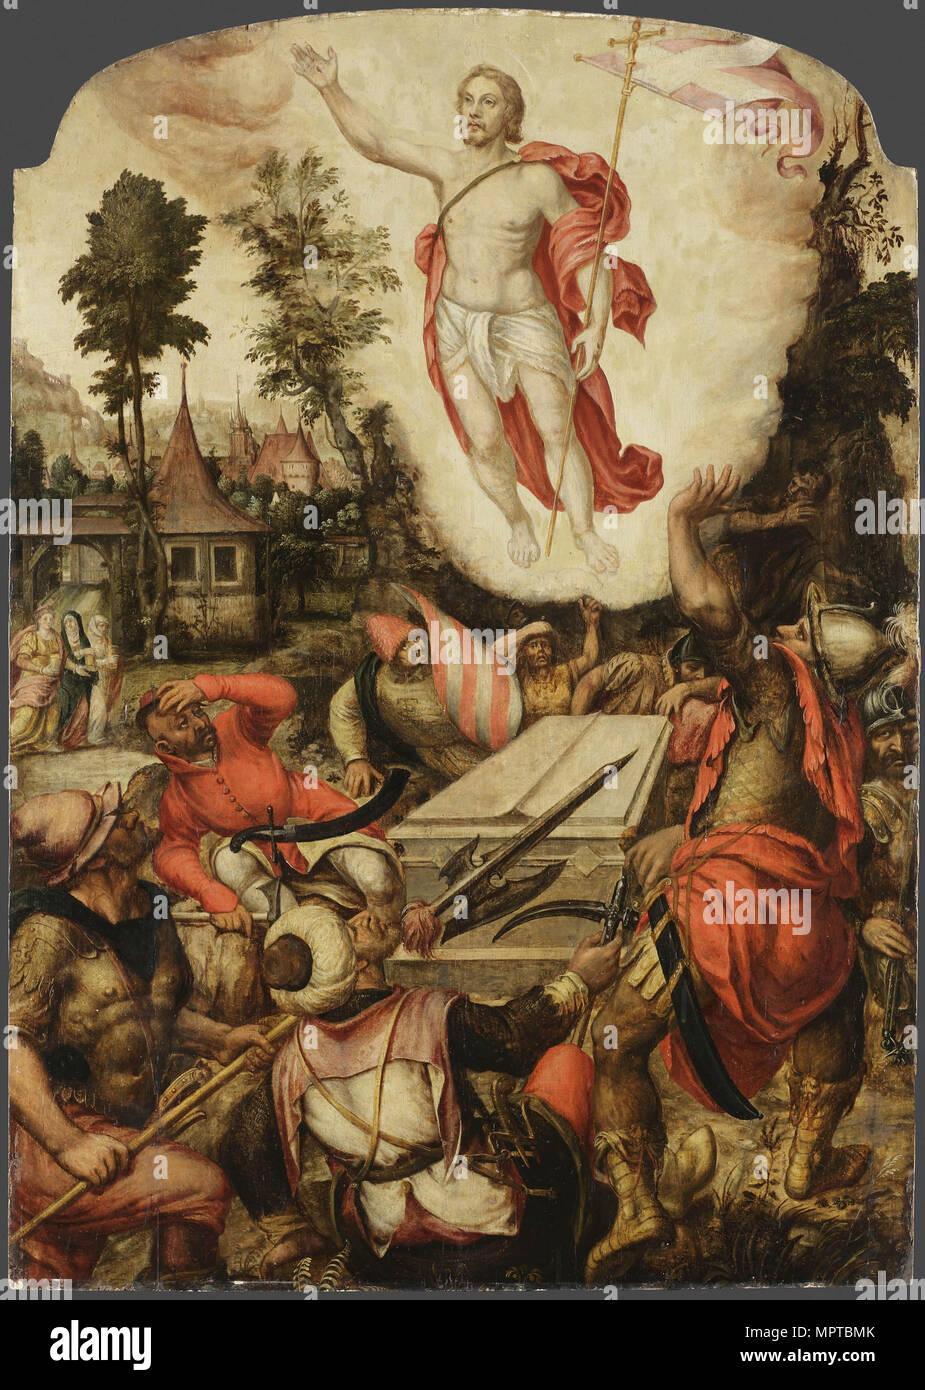 The Resurrection of Christ. - Stock Image